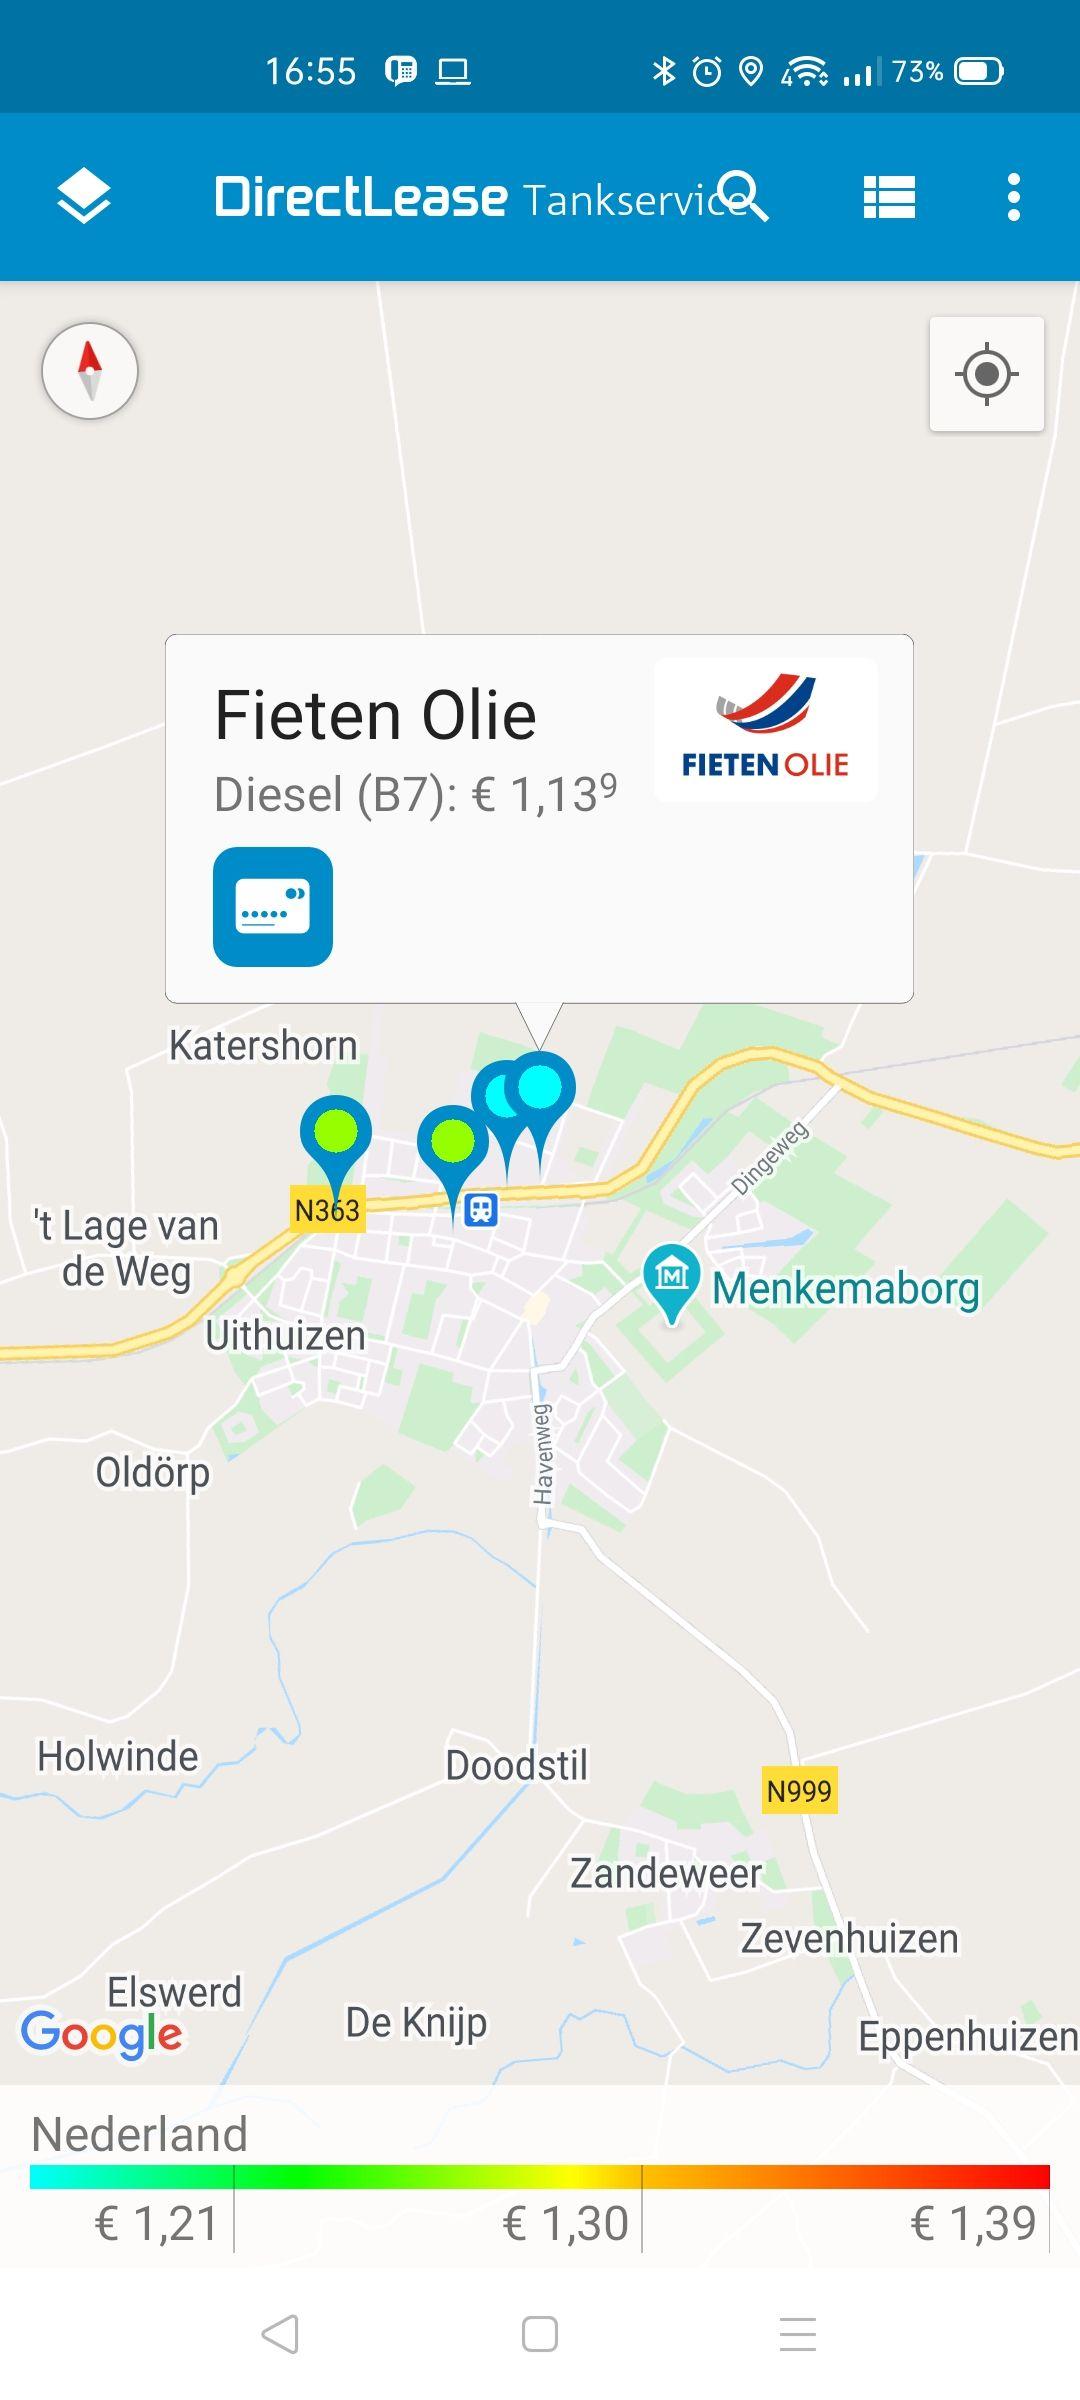 Laagste diesel prijs in Nederland?